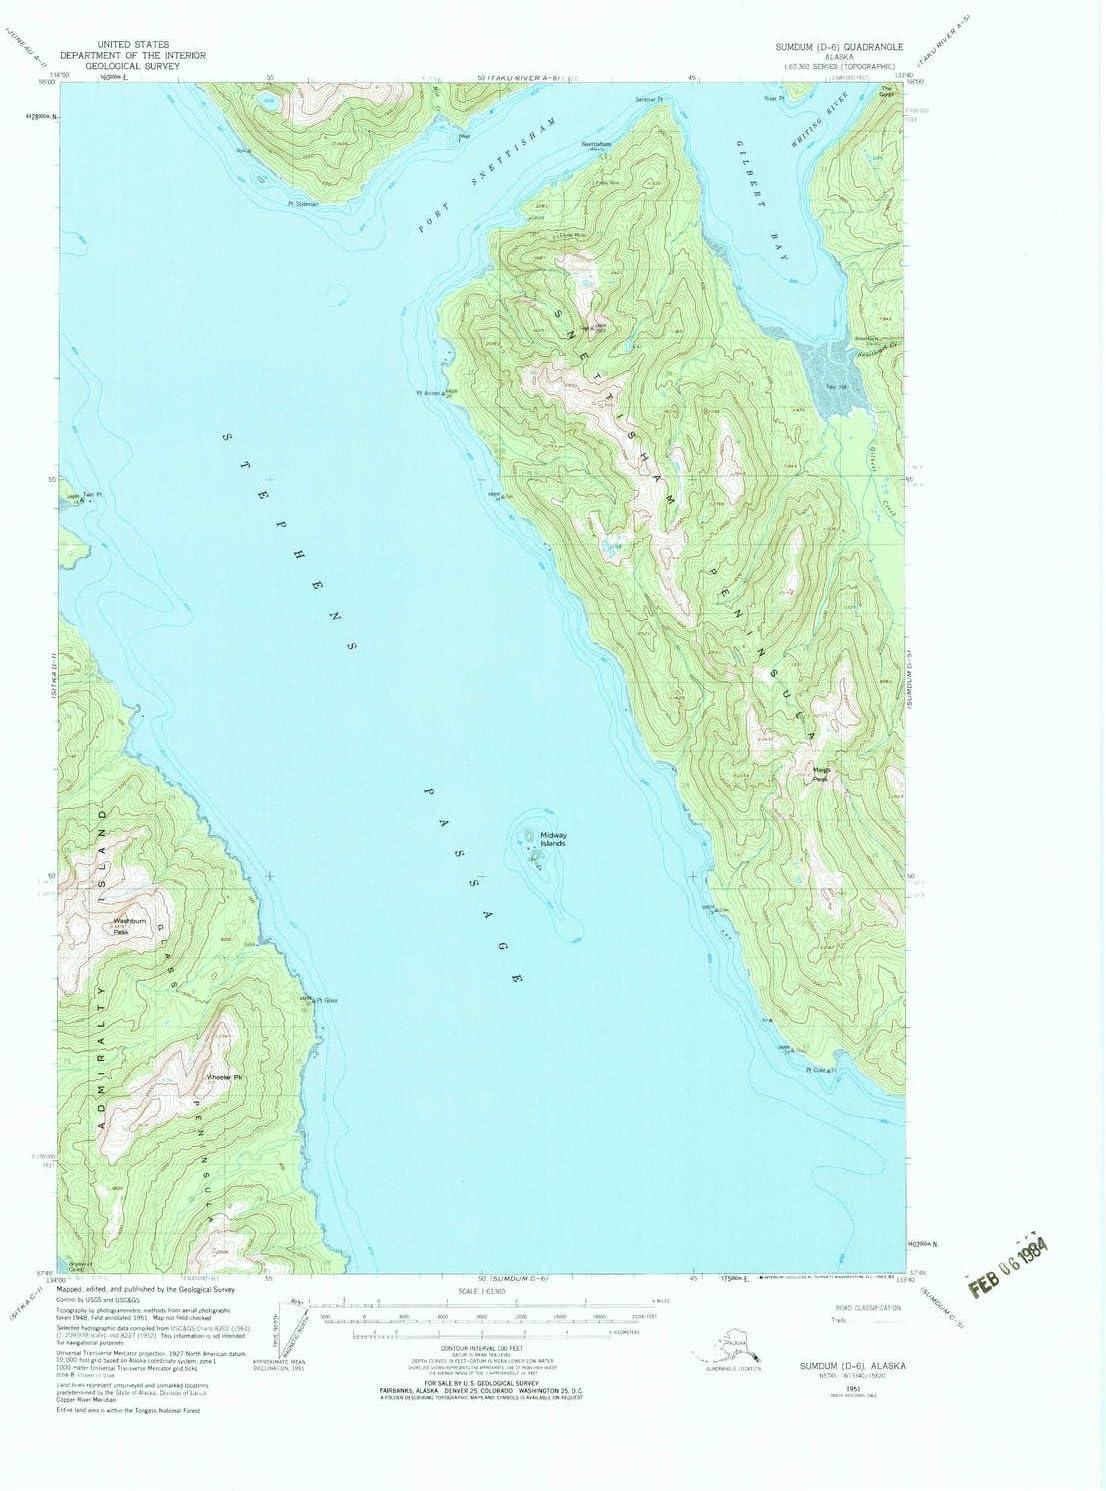 YellowMaps 5 ☆ very popular Sumdum D 6 AK topo 15 1:63360 X Latest item map Scale Minute